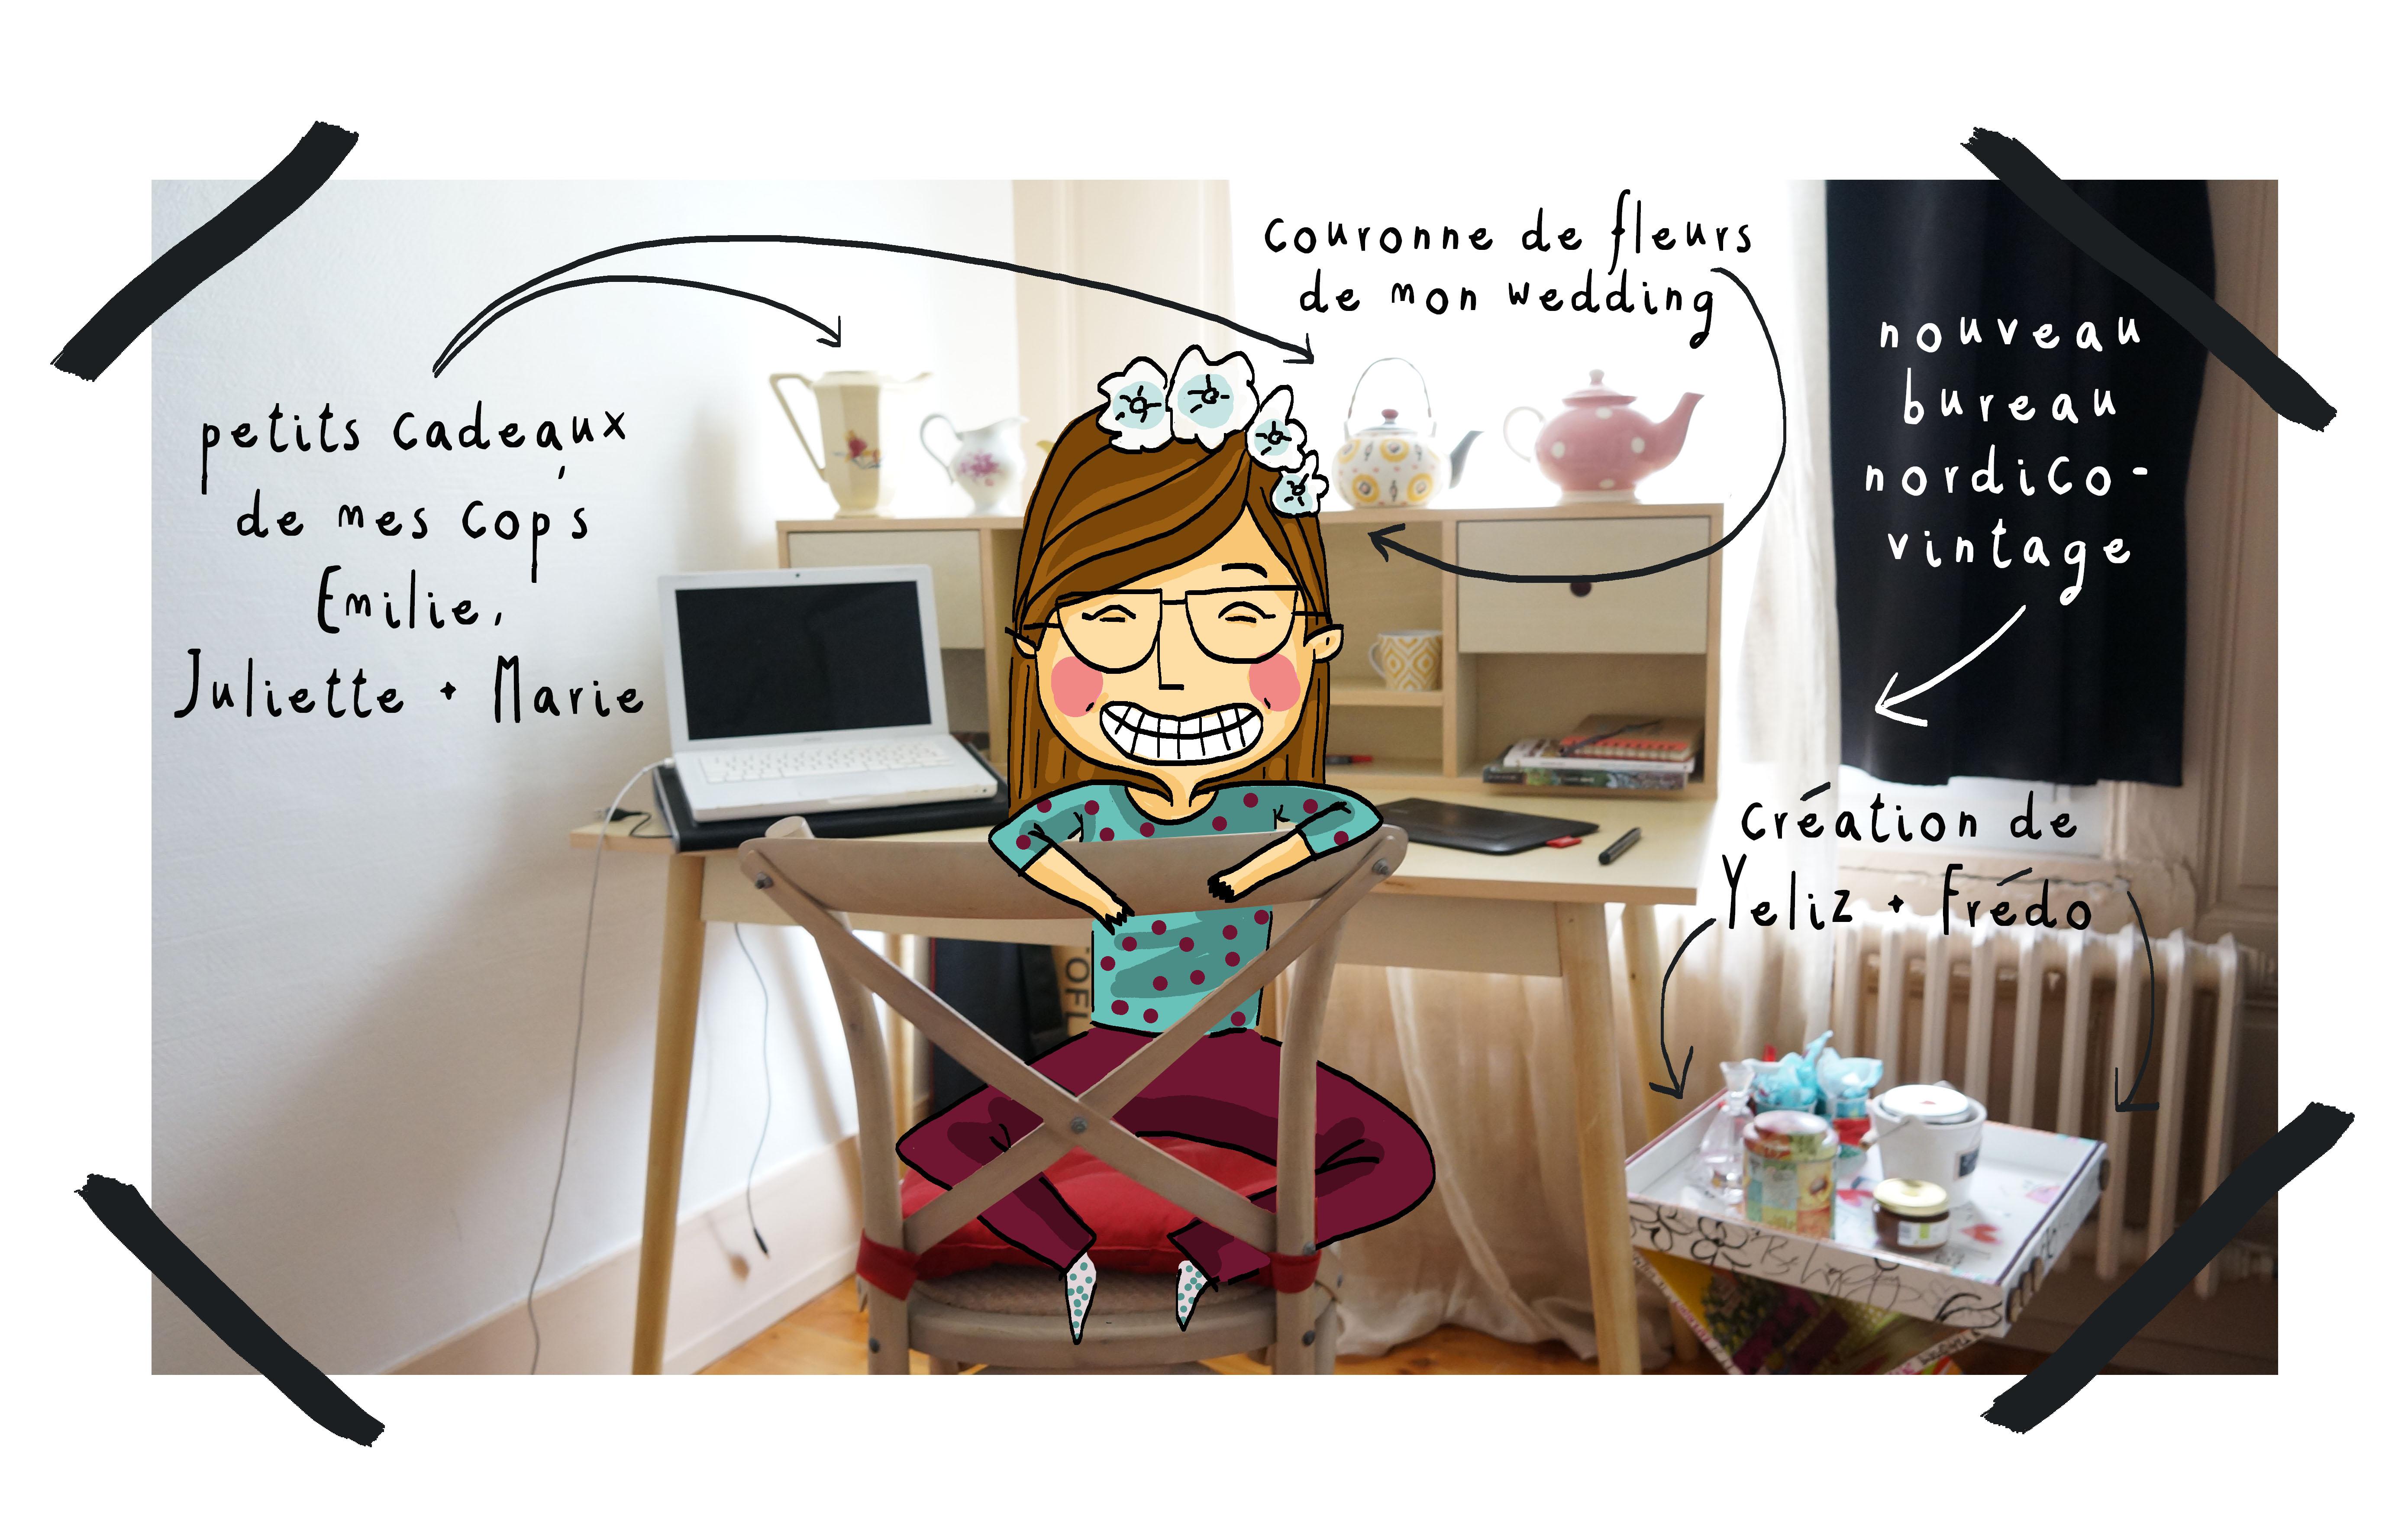 petit instantan cocooning bon week end et bienvenue bureau nordique wonder tiffany. Black Bedroom Furniture Sets. Home Design Ideas